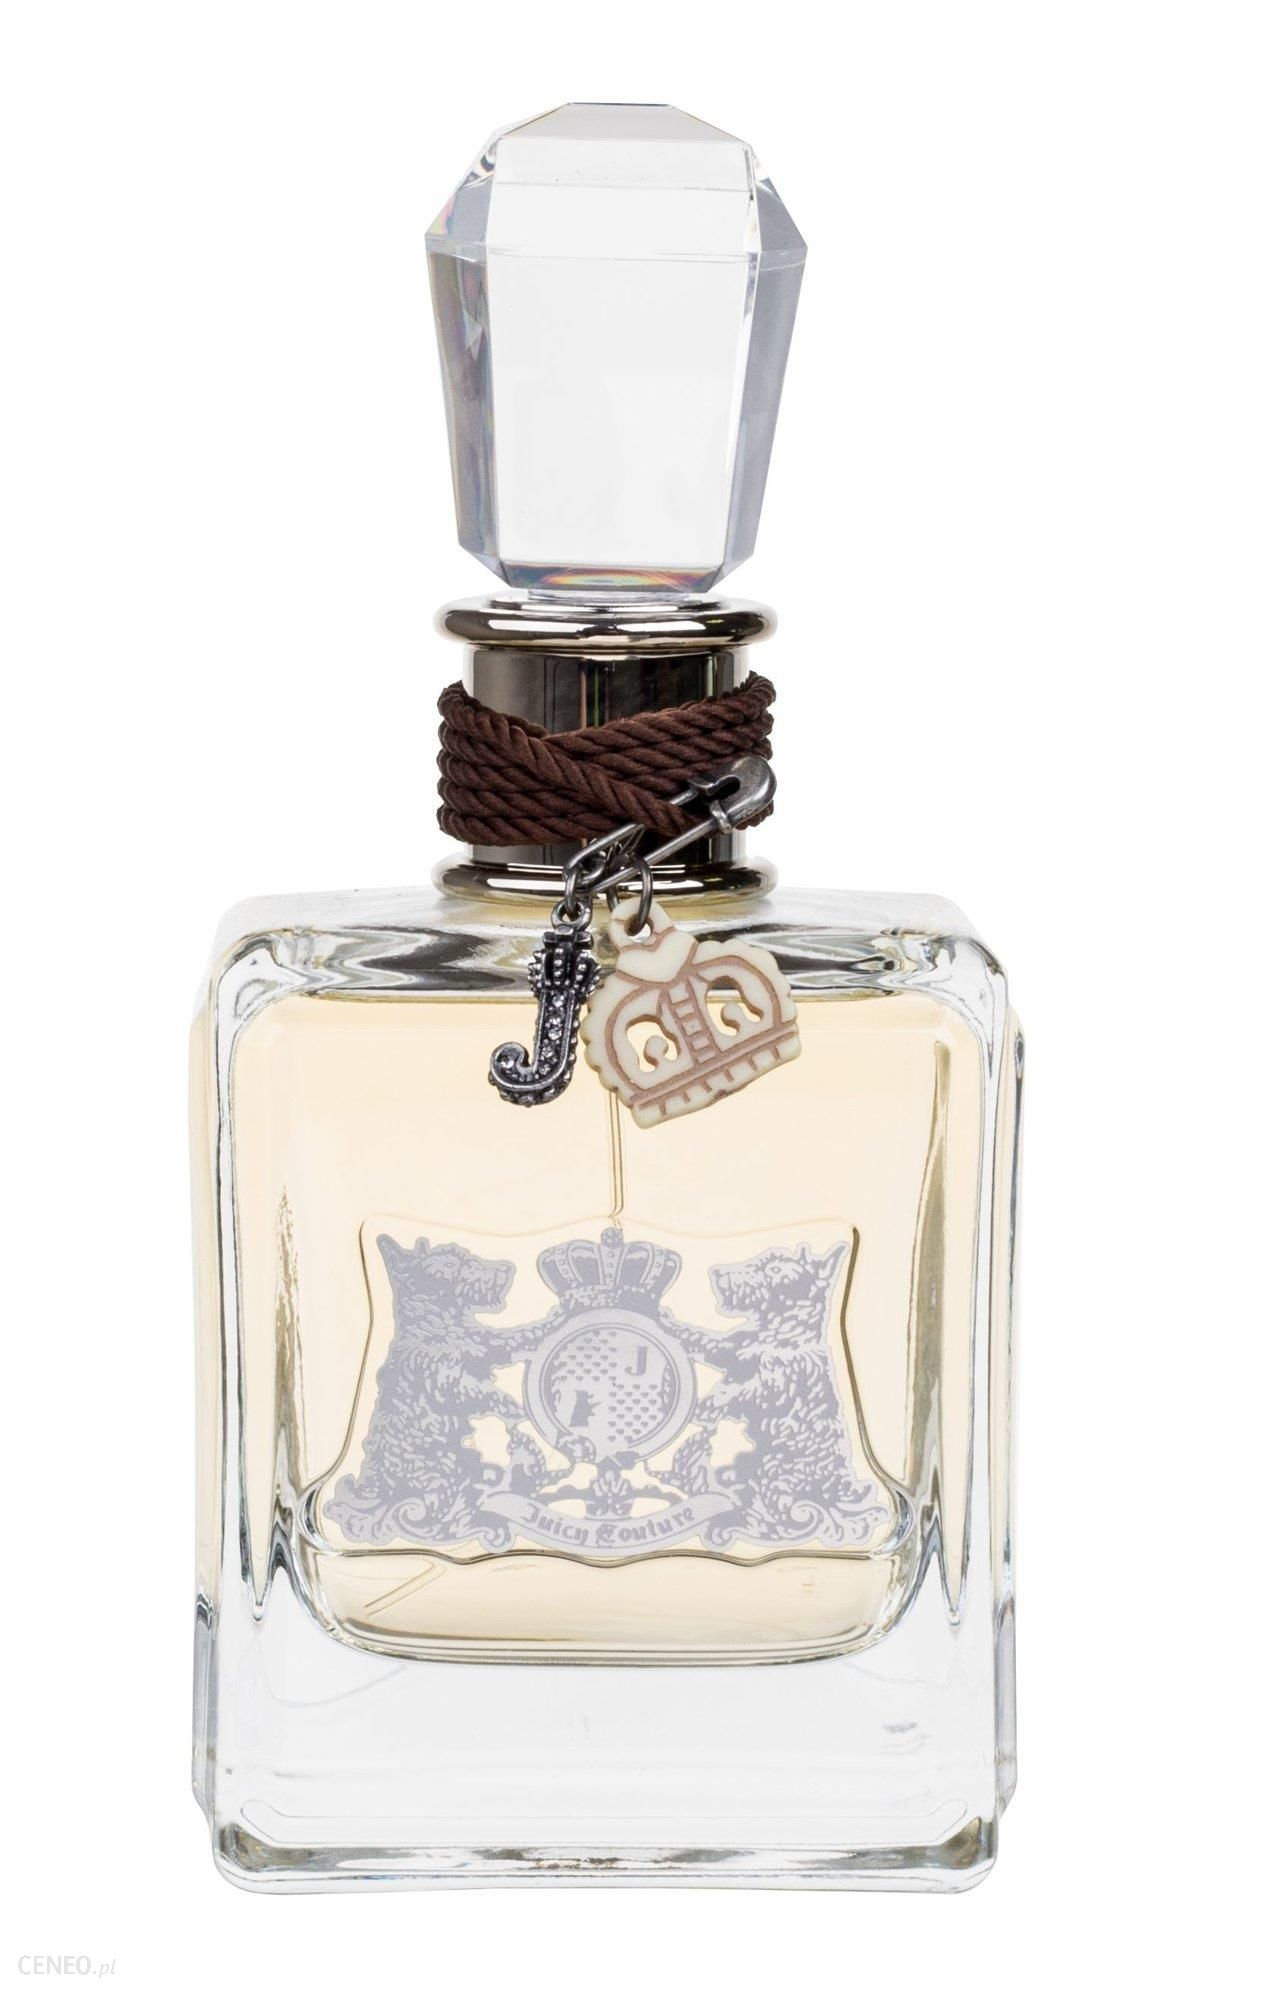 Juicy Couture Juicy Couture Woda Perfumowana 100Ml